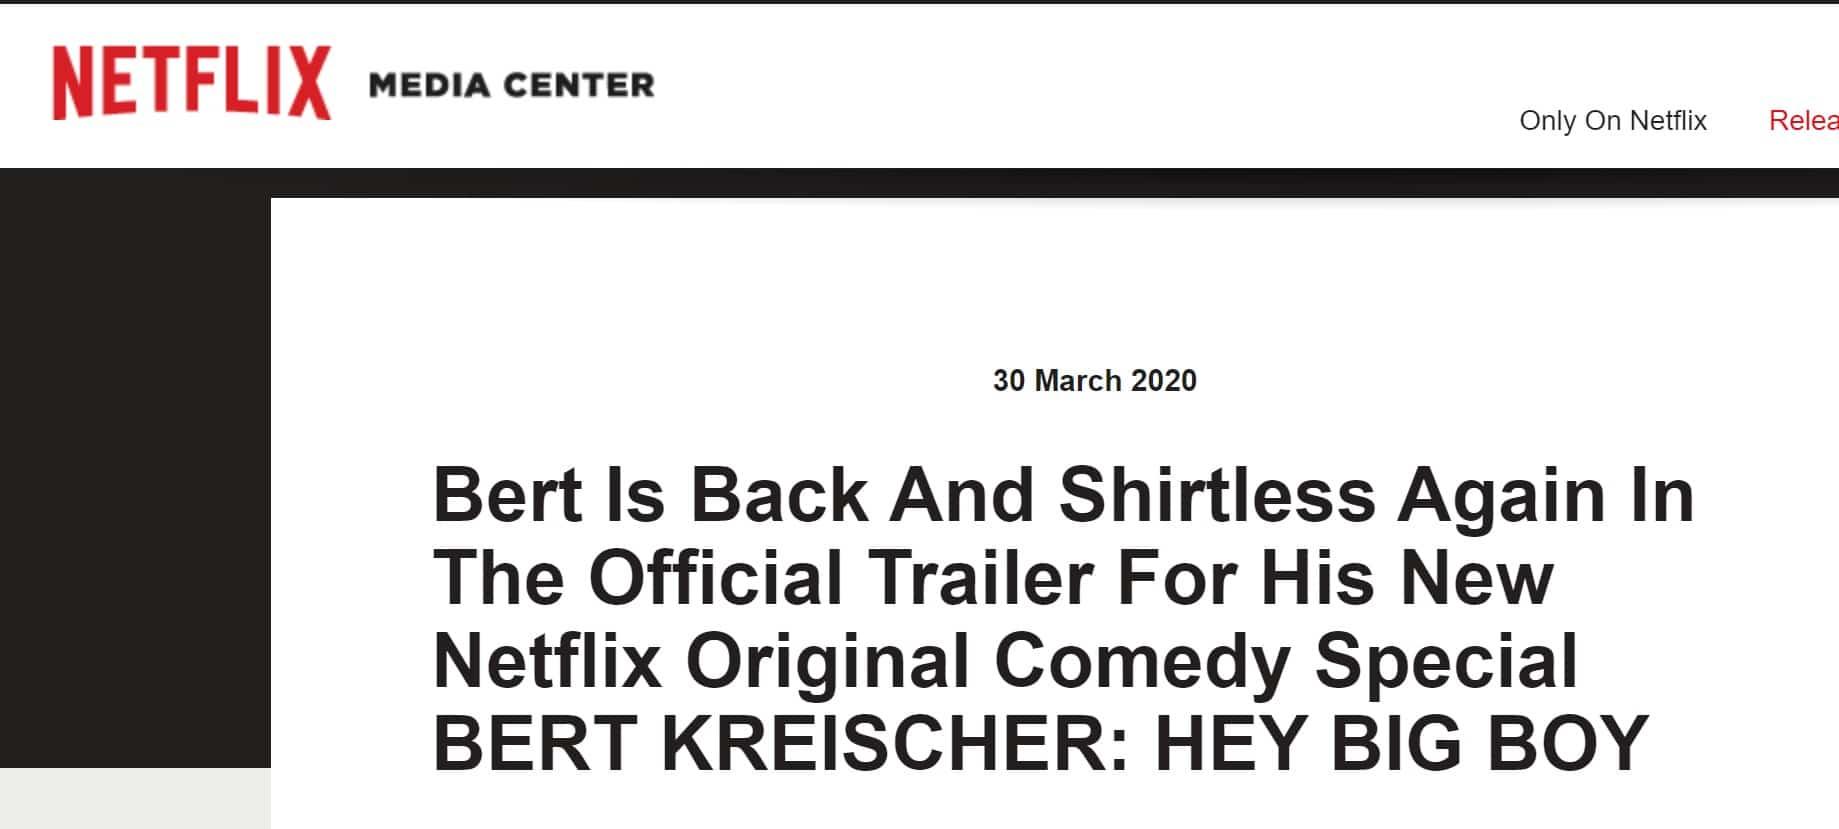 Netflix press release headline